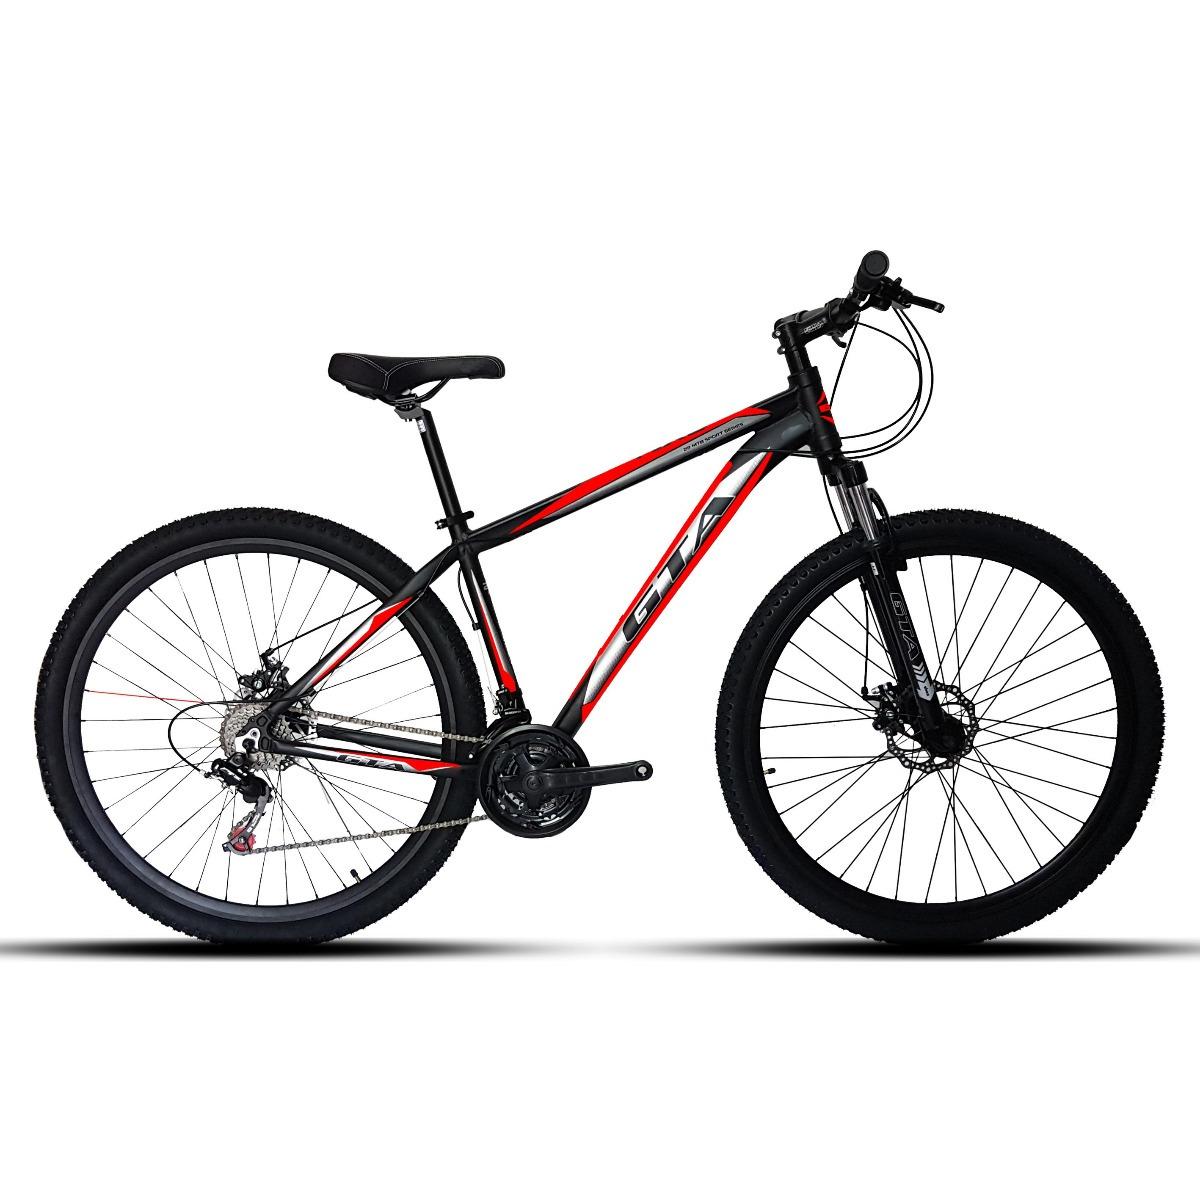 42580e30f bicicleta aro 29 gta nx9 cambio shimano 24v disco promocao. Carregando zoom.